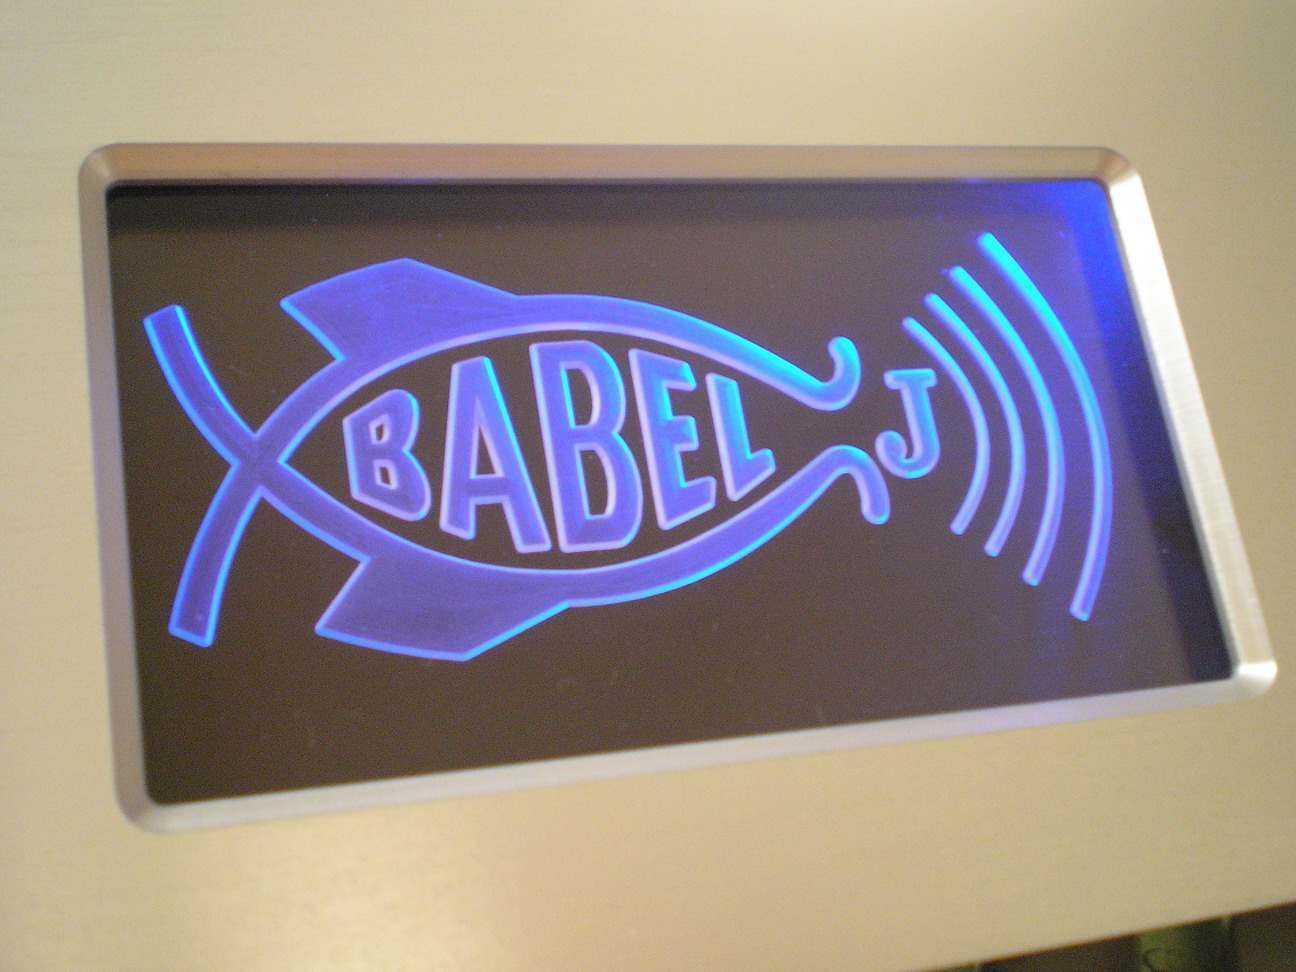 Prednja ploča sa akrilnom maskom BABEL  J   /  jun.2009.